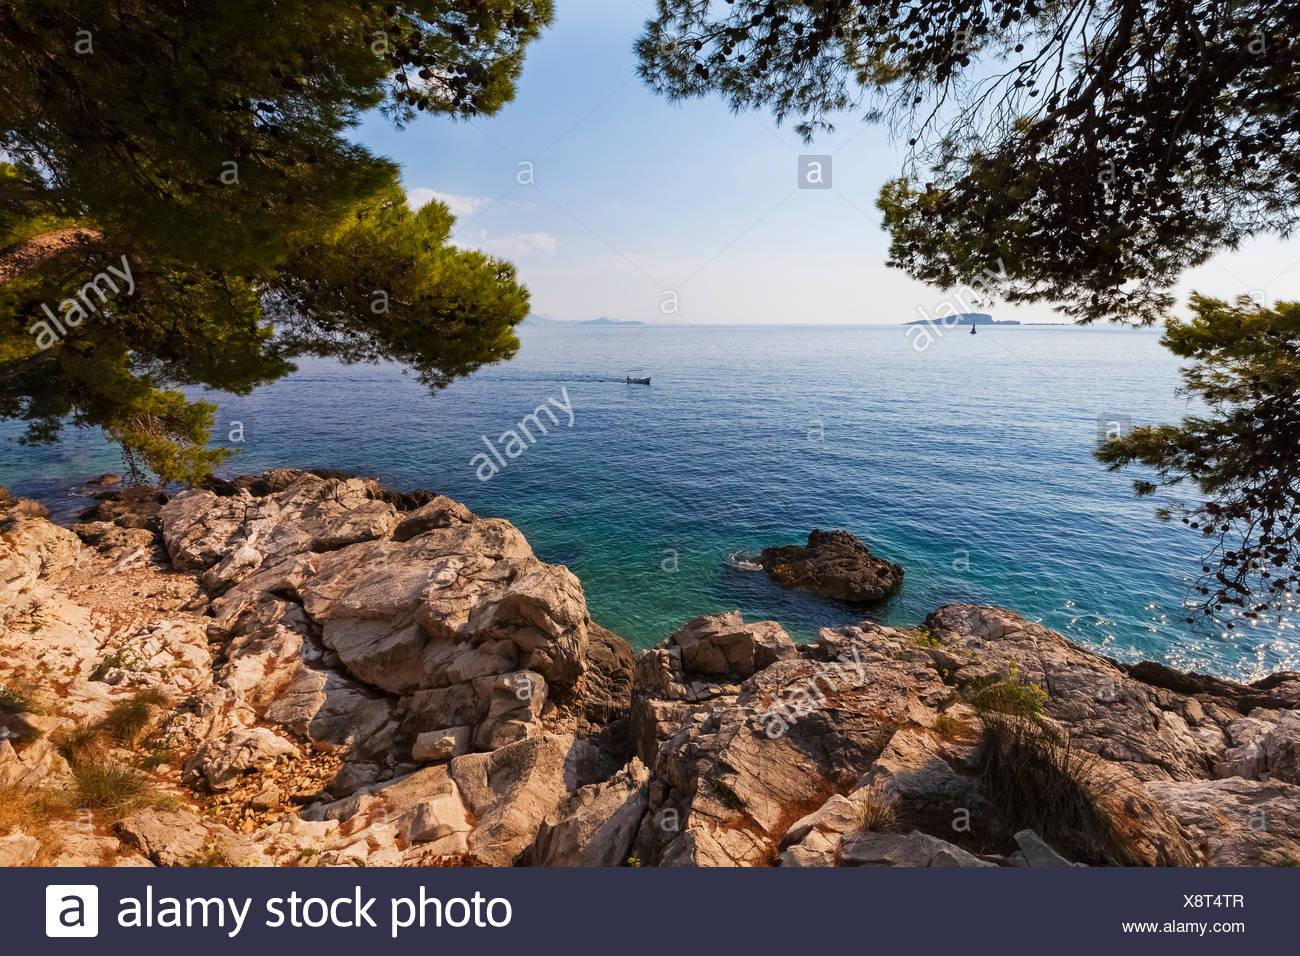 View from the rocky shoreline of Cavtat; Cavtat, Croatia - Stock Image